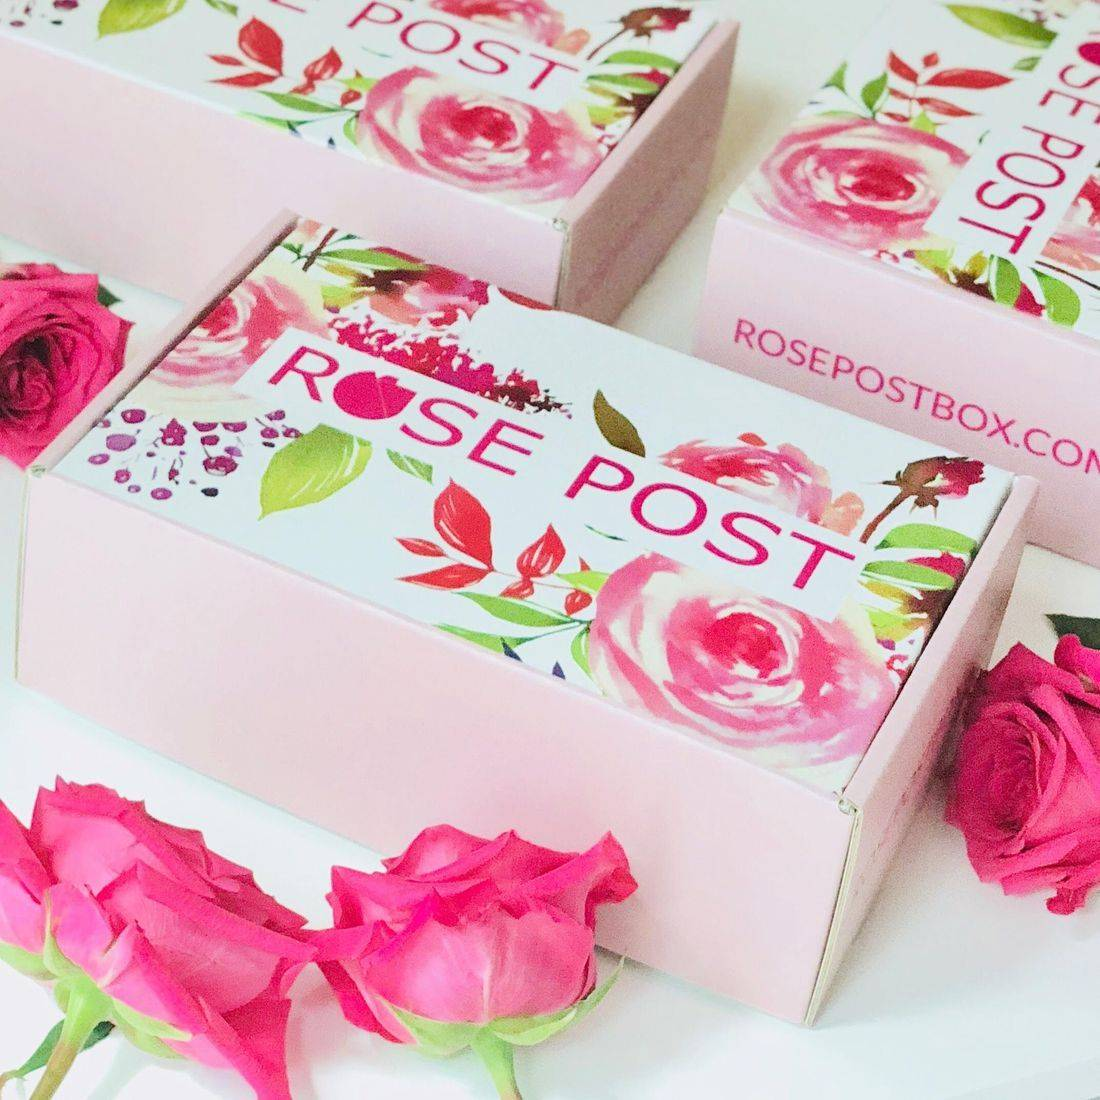 Rose Gift Box, RosePost Spring Box, RosePost Box, Green Beauty Subscription, Rose Beauty Box, Green Beauty Box, Rose Skincare, Clean Rose Beauty